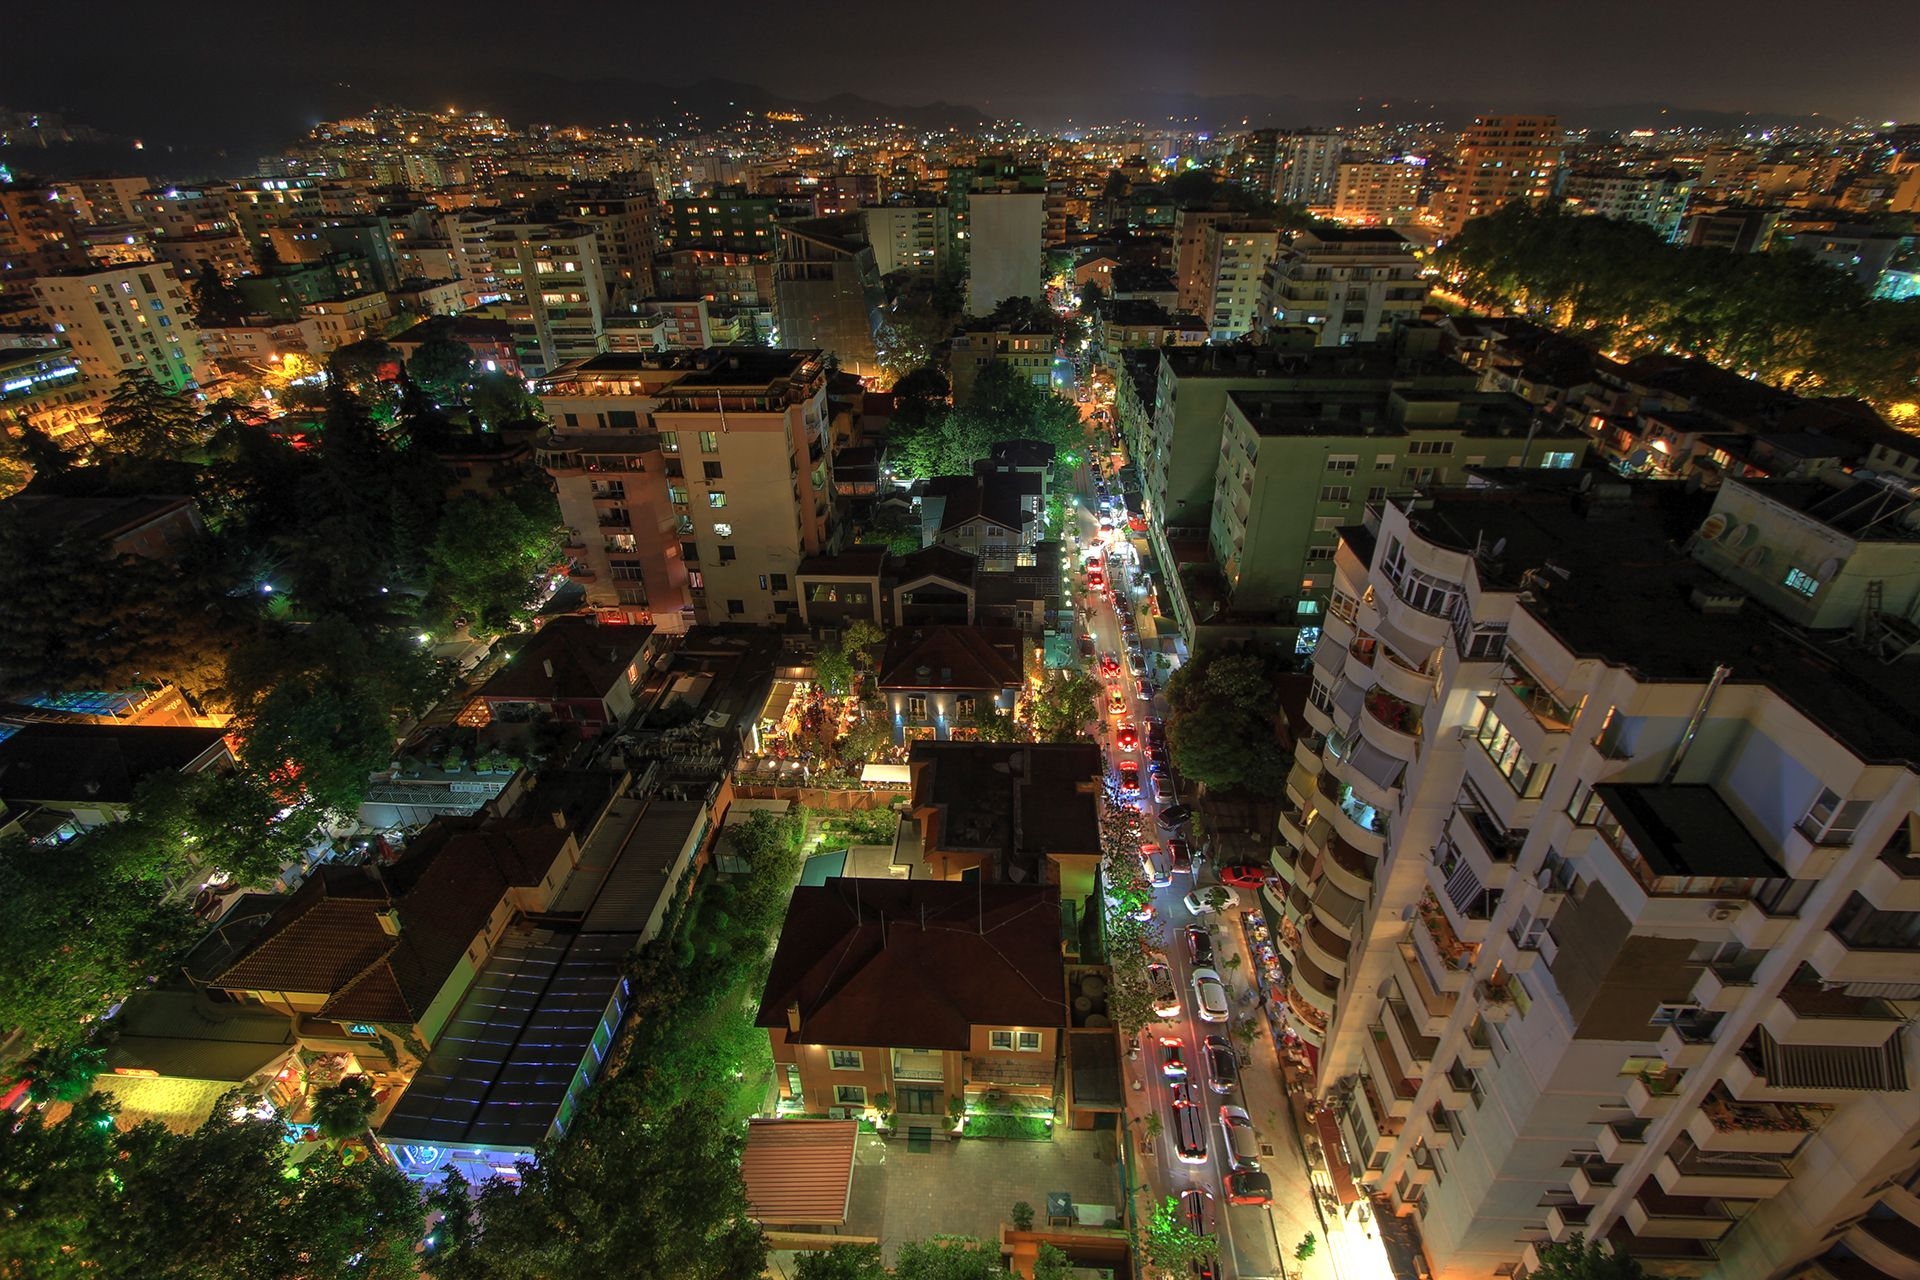 Rooftop 16,Tirana Rribrahim Rugova,Sky Tower